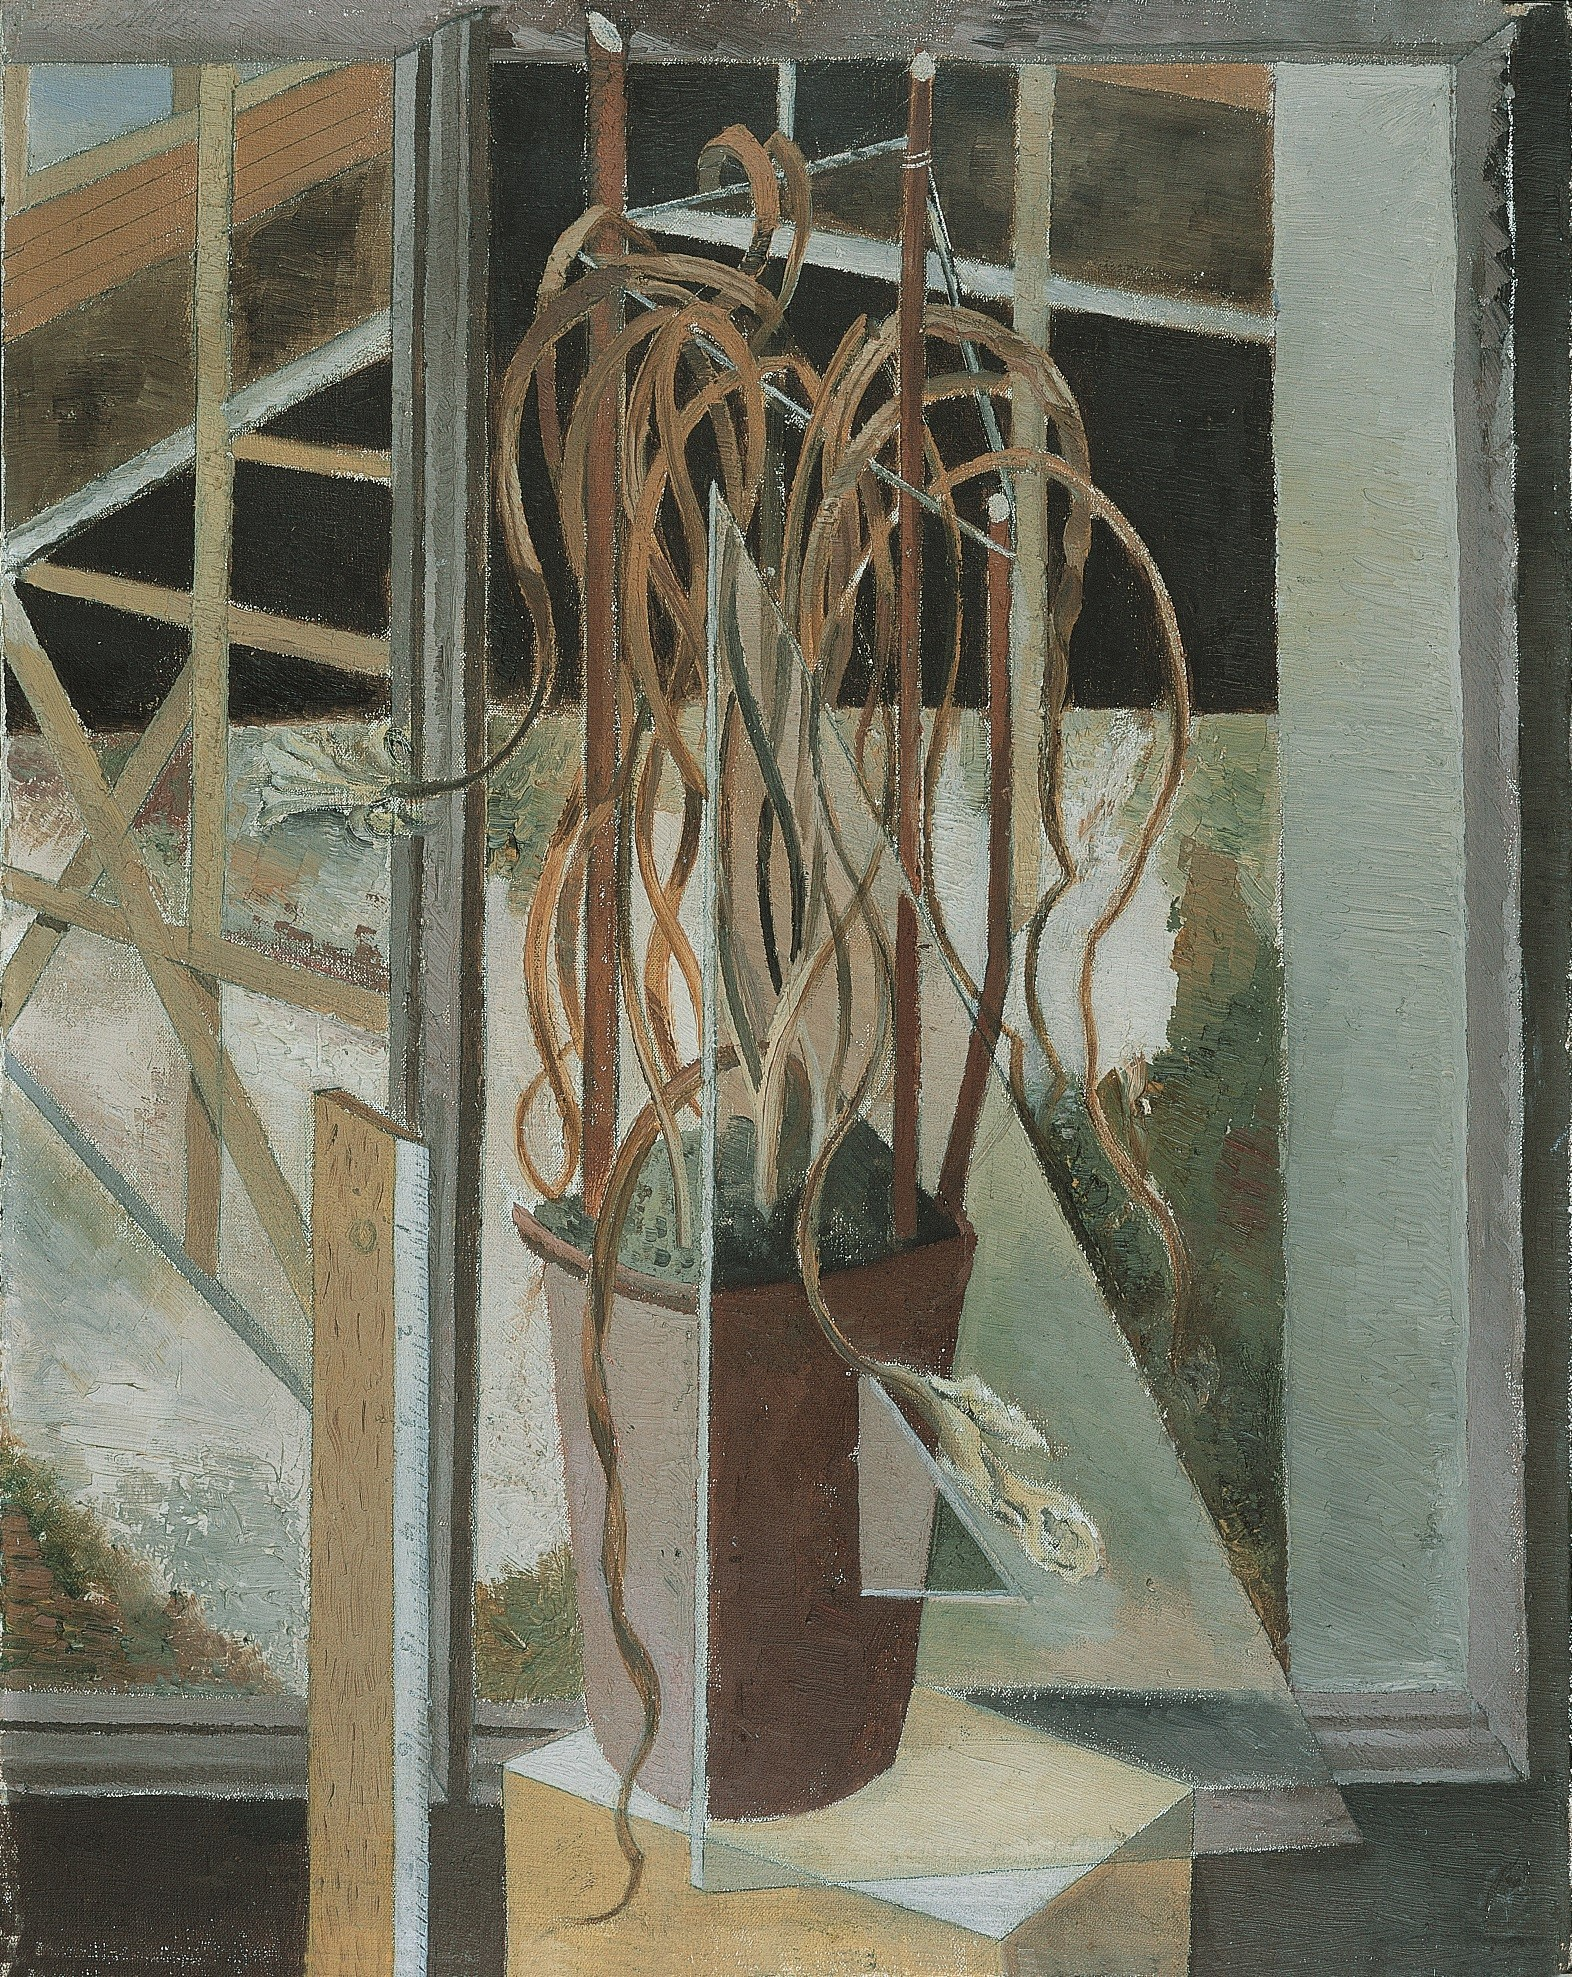 Paul Nash, Dead Spring (1929)